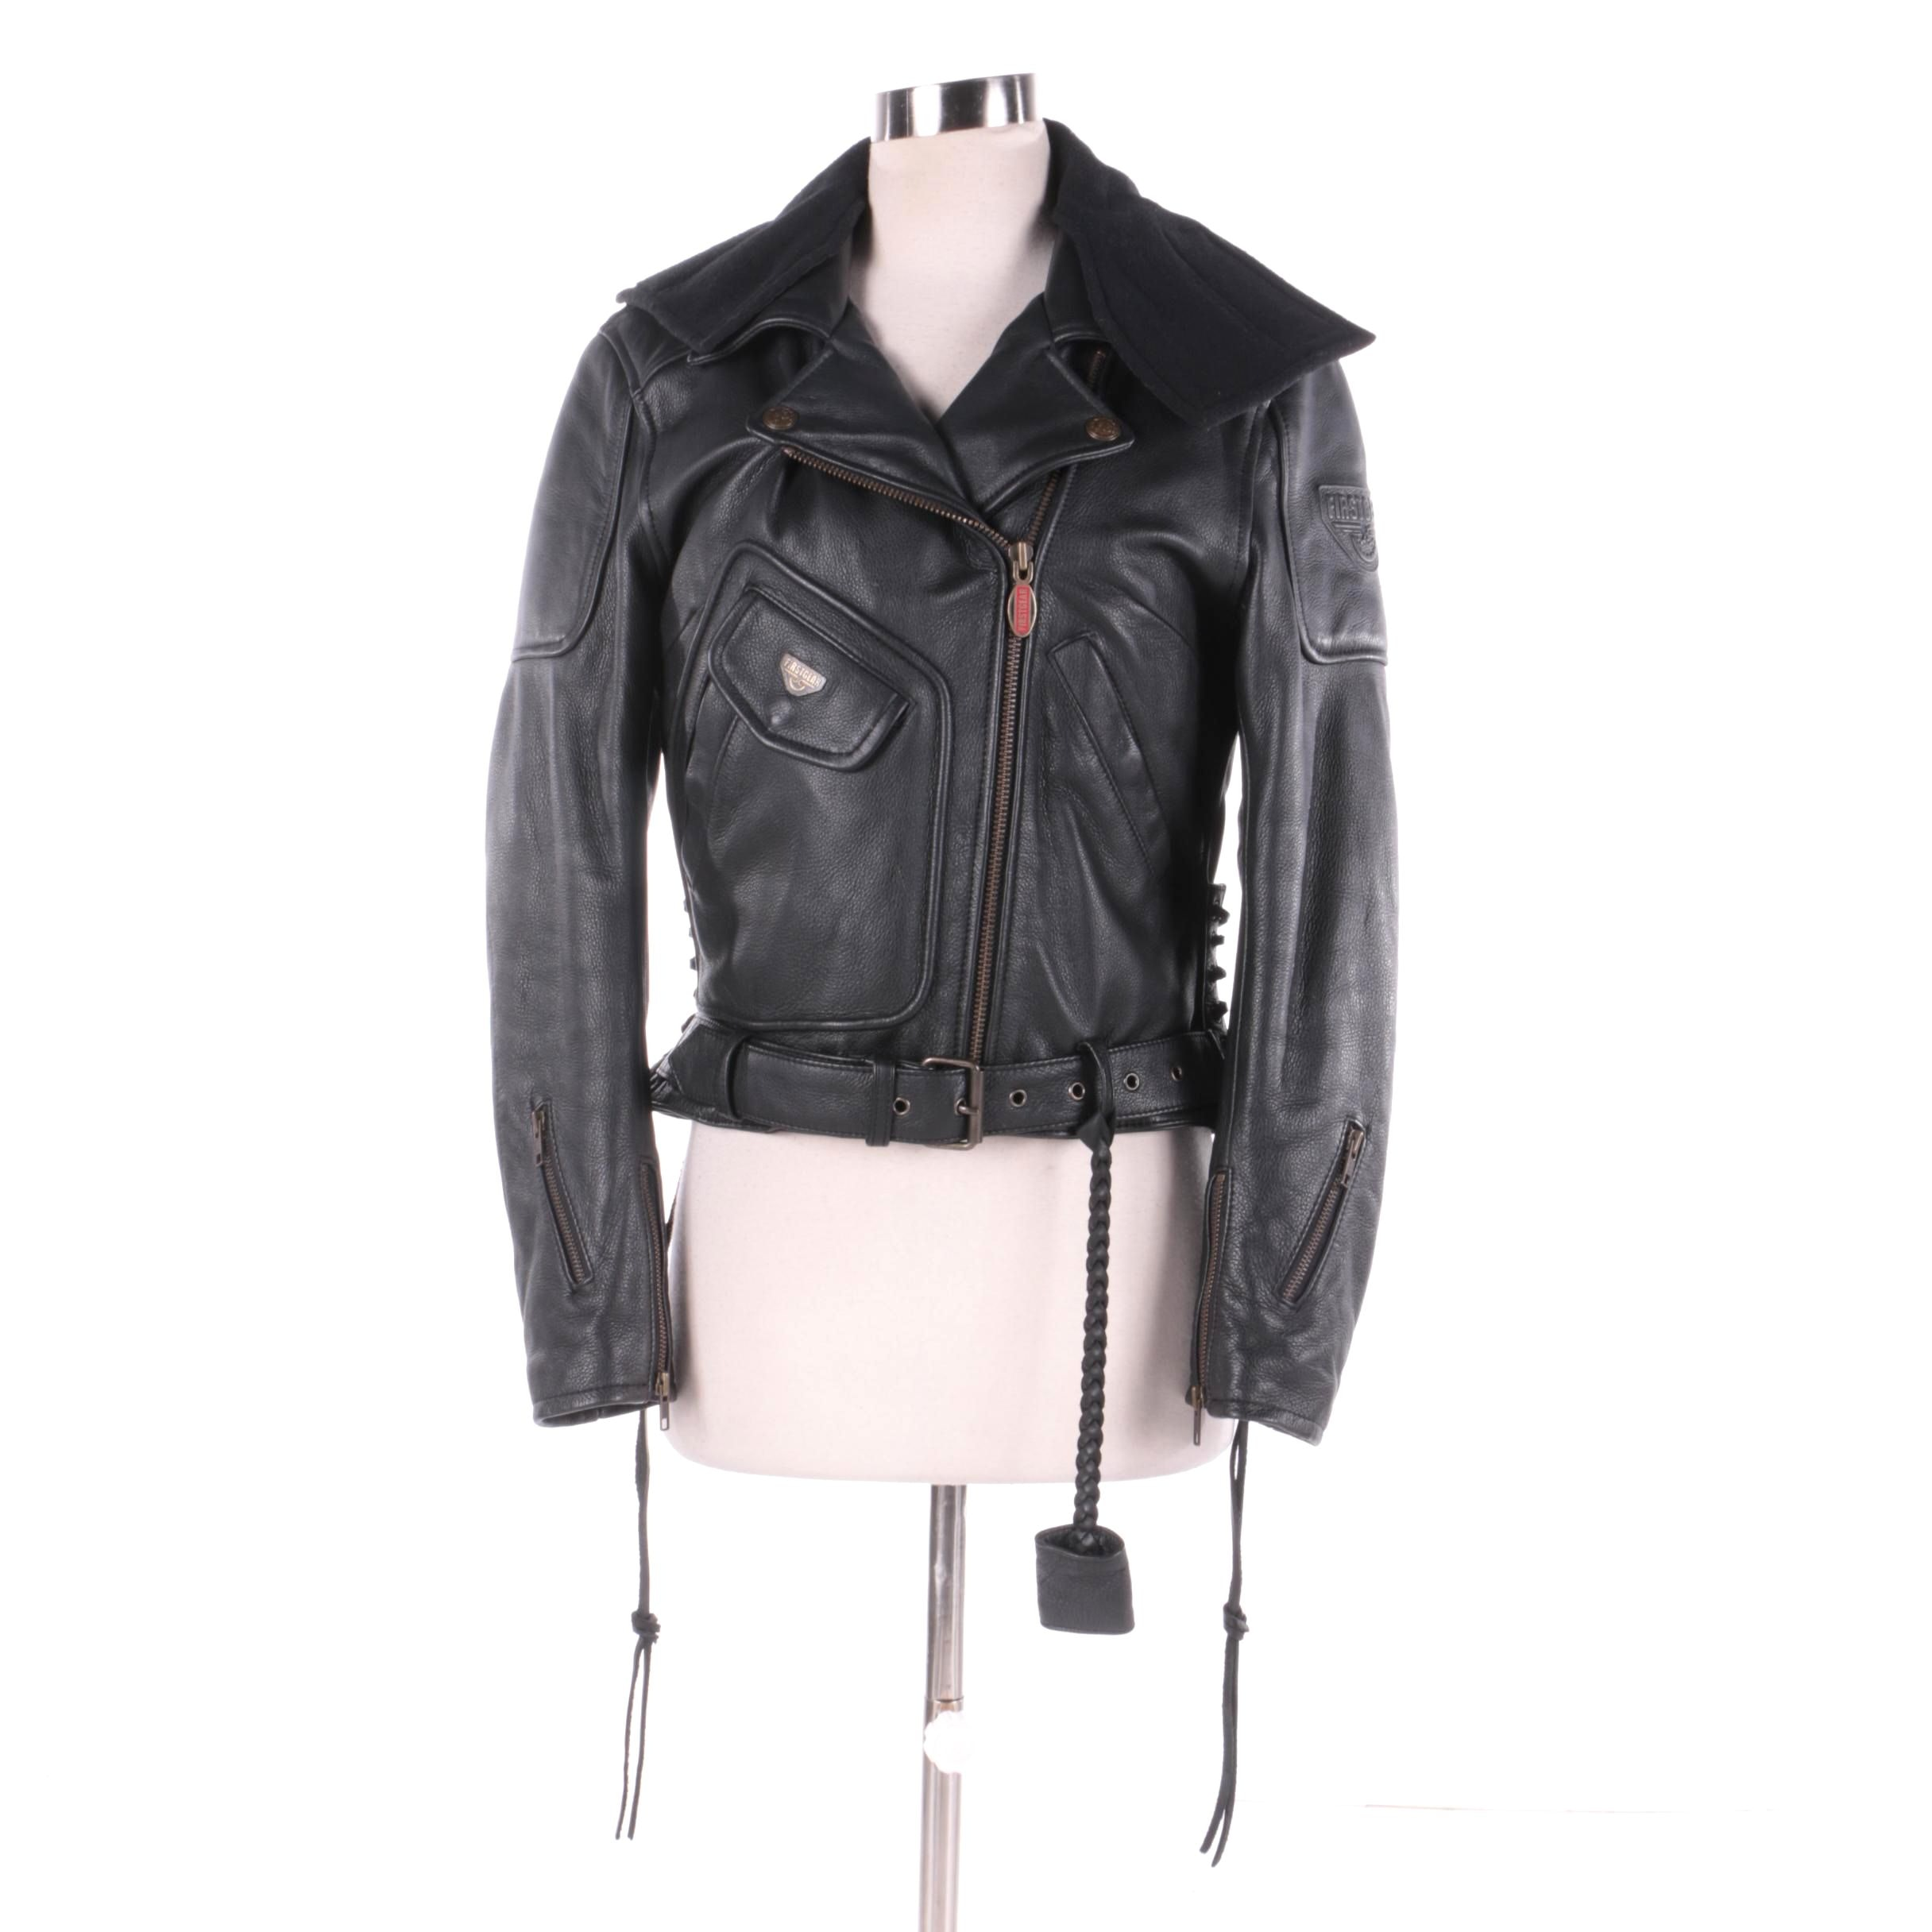 Women's Firstgear Black Leather Motorcycle Jacket